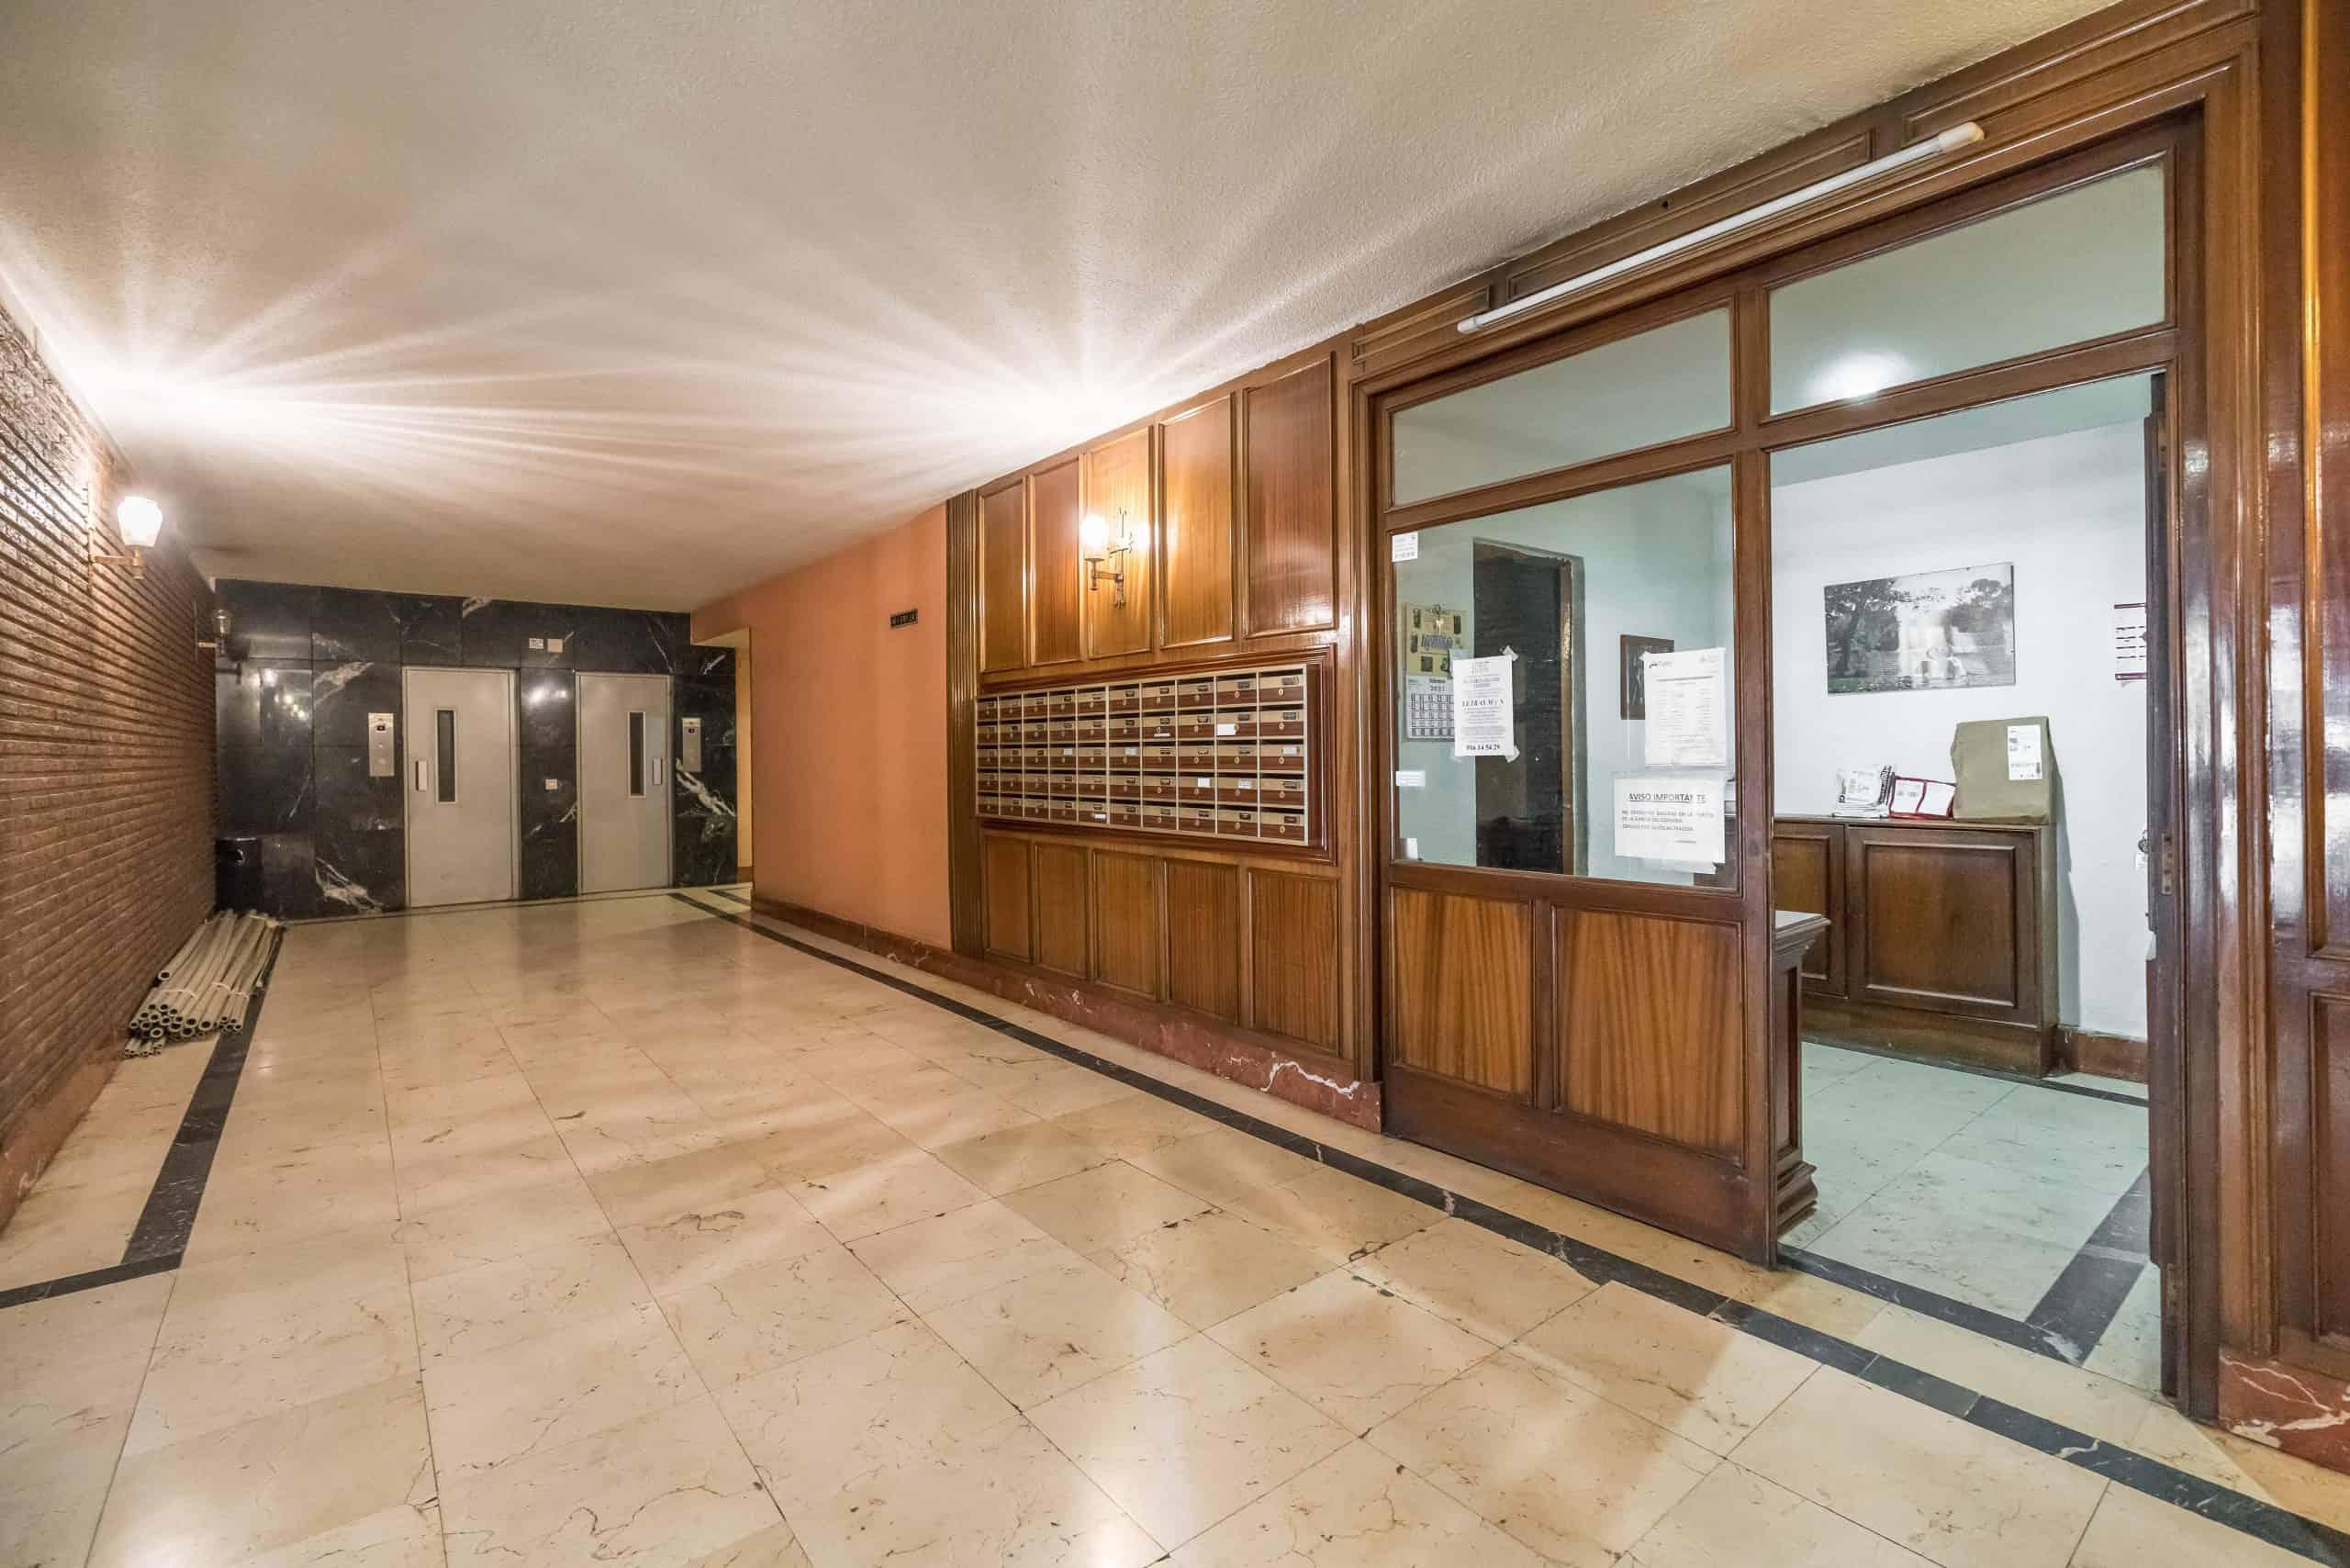 Agencia Inmobiliaria de Madrid-FUTUROCASA-Zona ARGANZUELA-LEGAZPI -calle Jaime Conquistador 48- Zonas Comunes 2